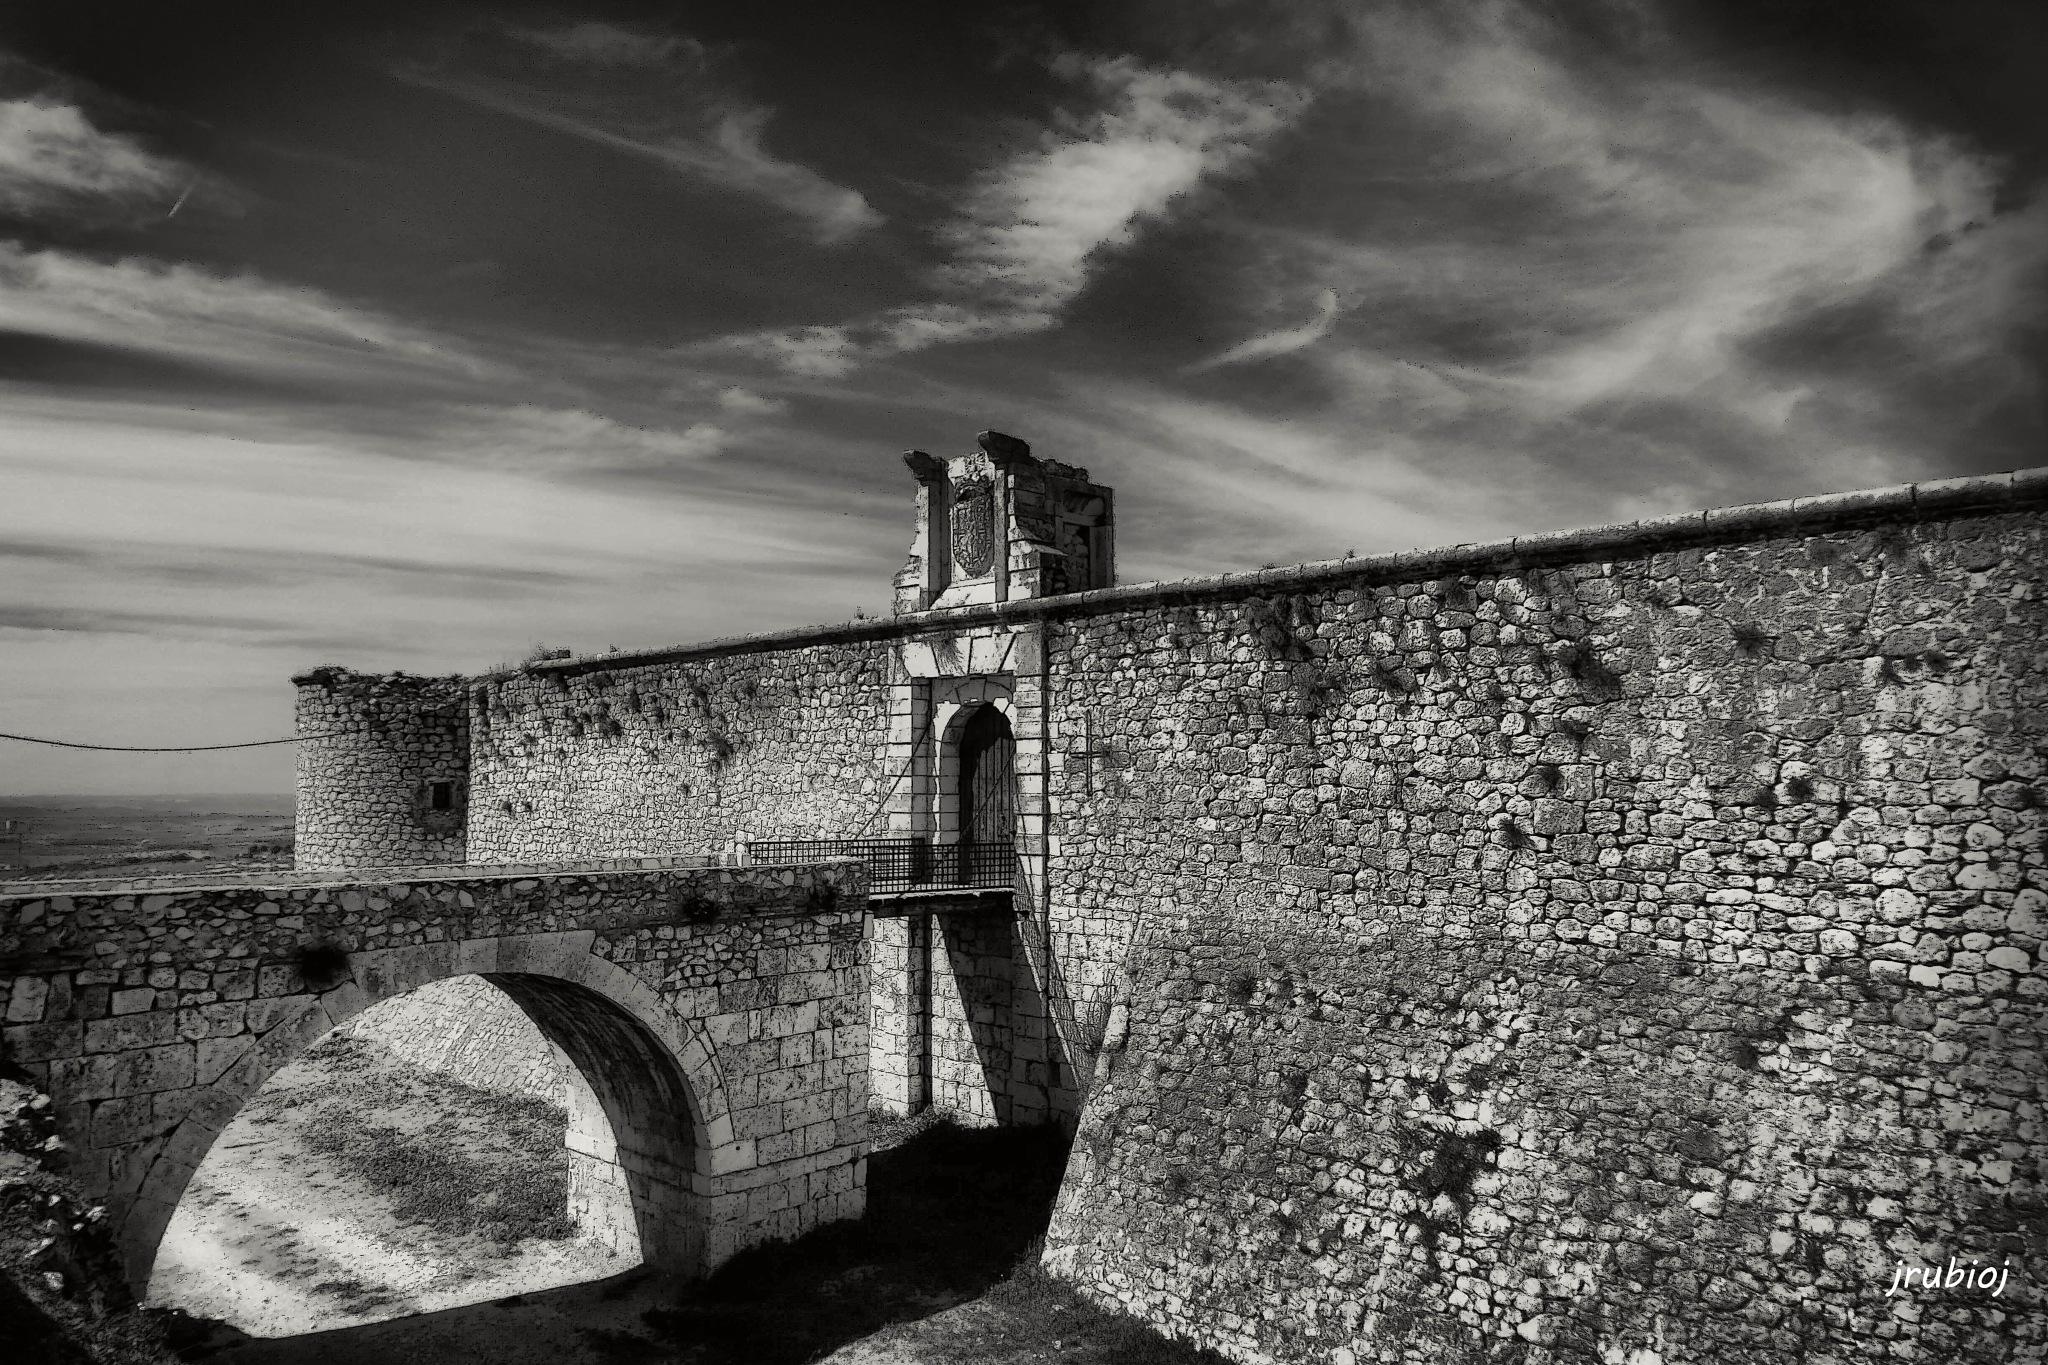 Castillo de Chinchon (Madrid) by julio rubio